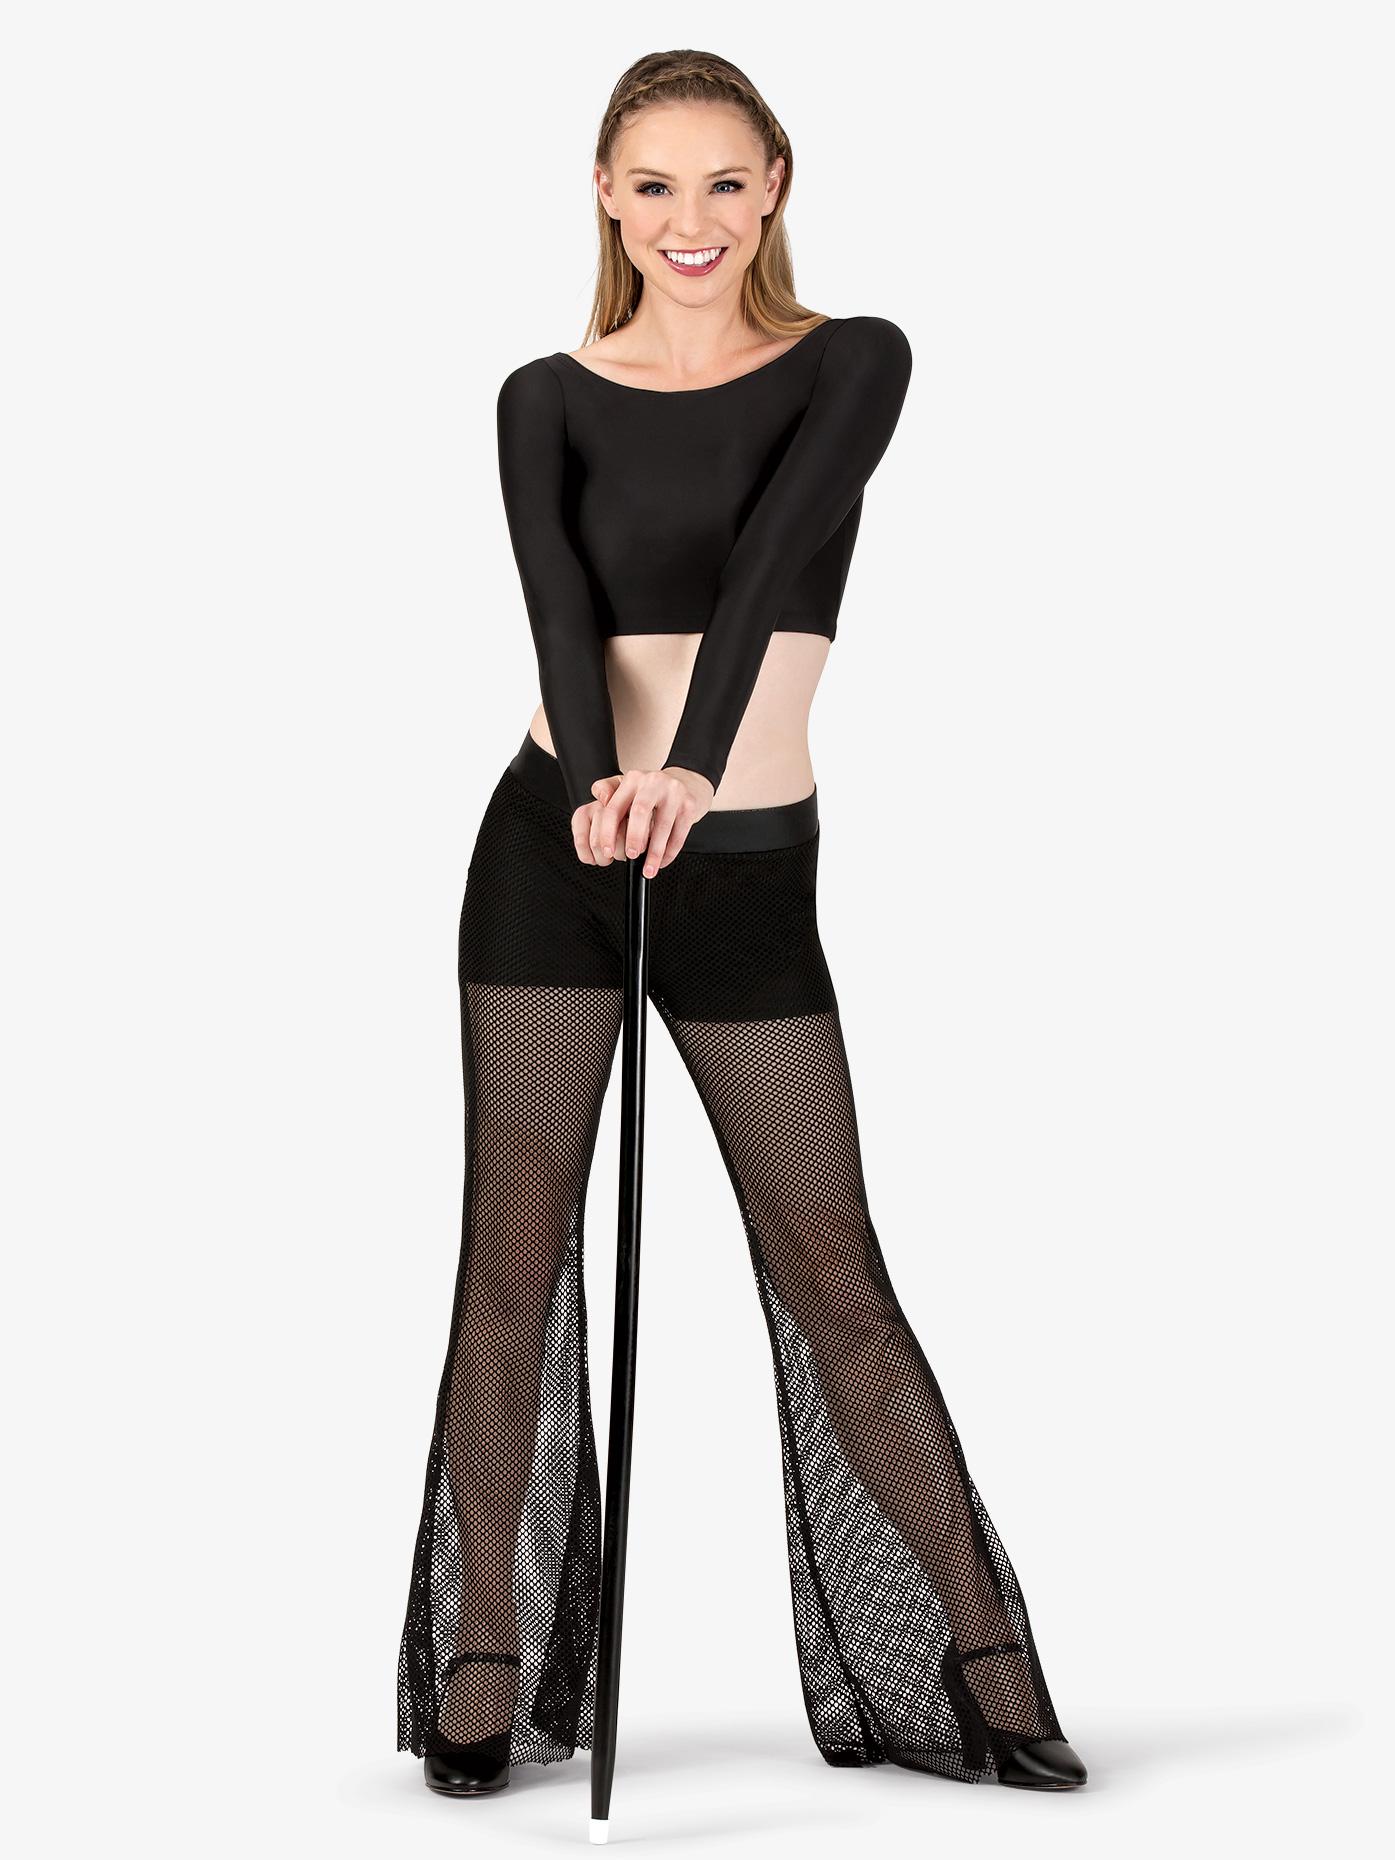 Double Platinum Womens Mesh Dance Bell Bottom Pants N7284